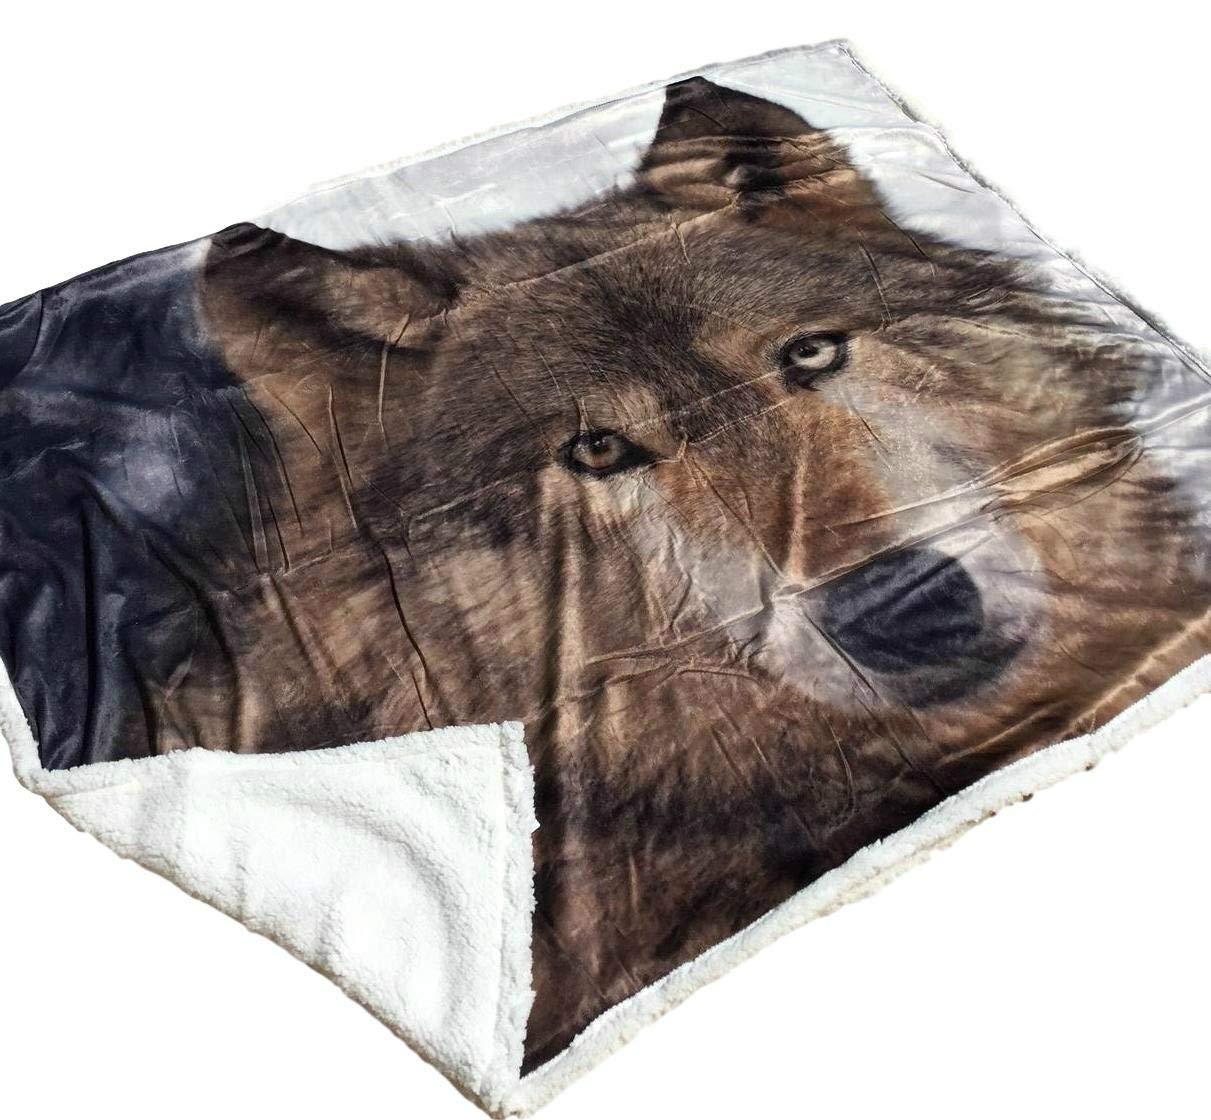 Solaron Original Pack of Wolves Korean Mink Soft Plush Queen Size Blanket Green